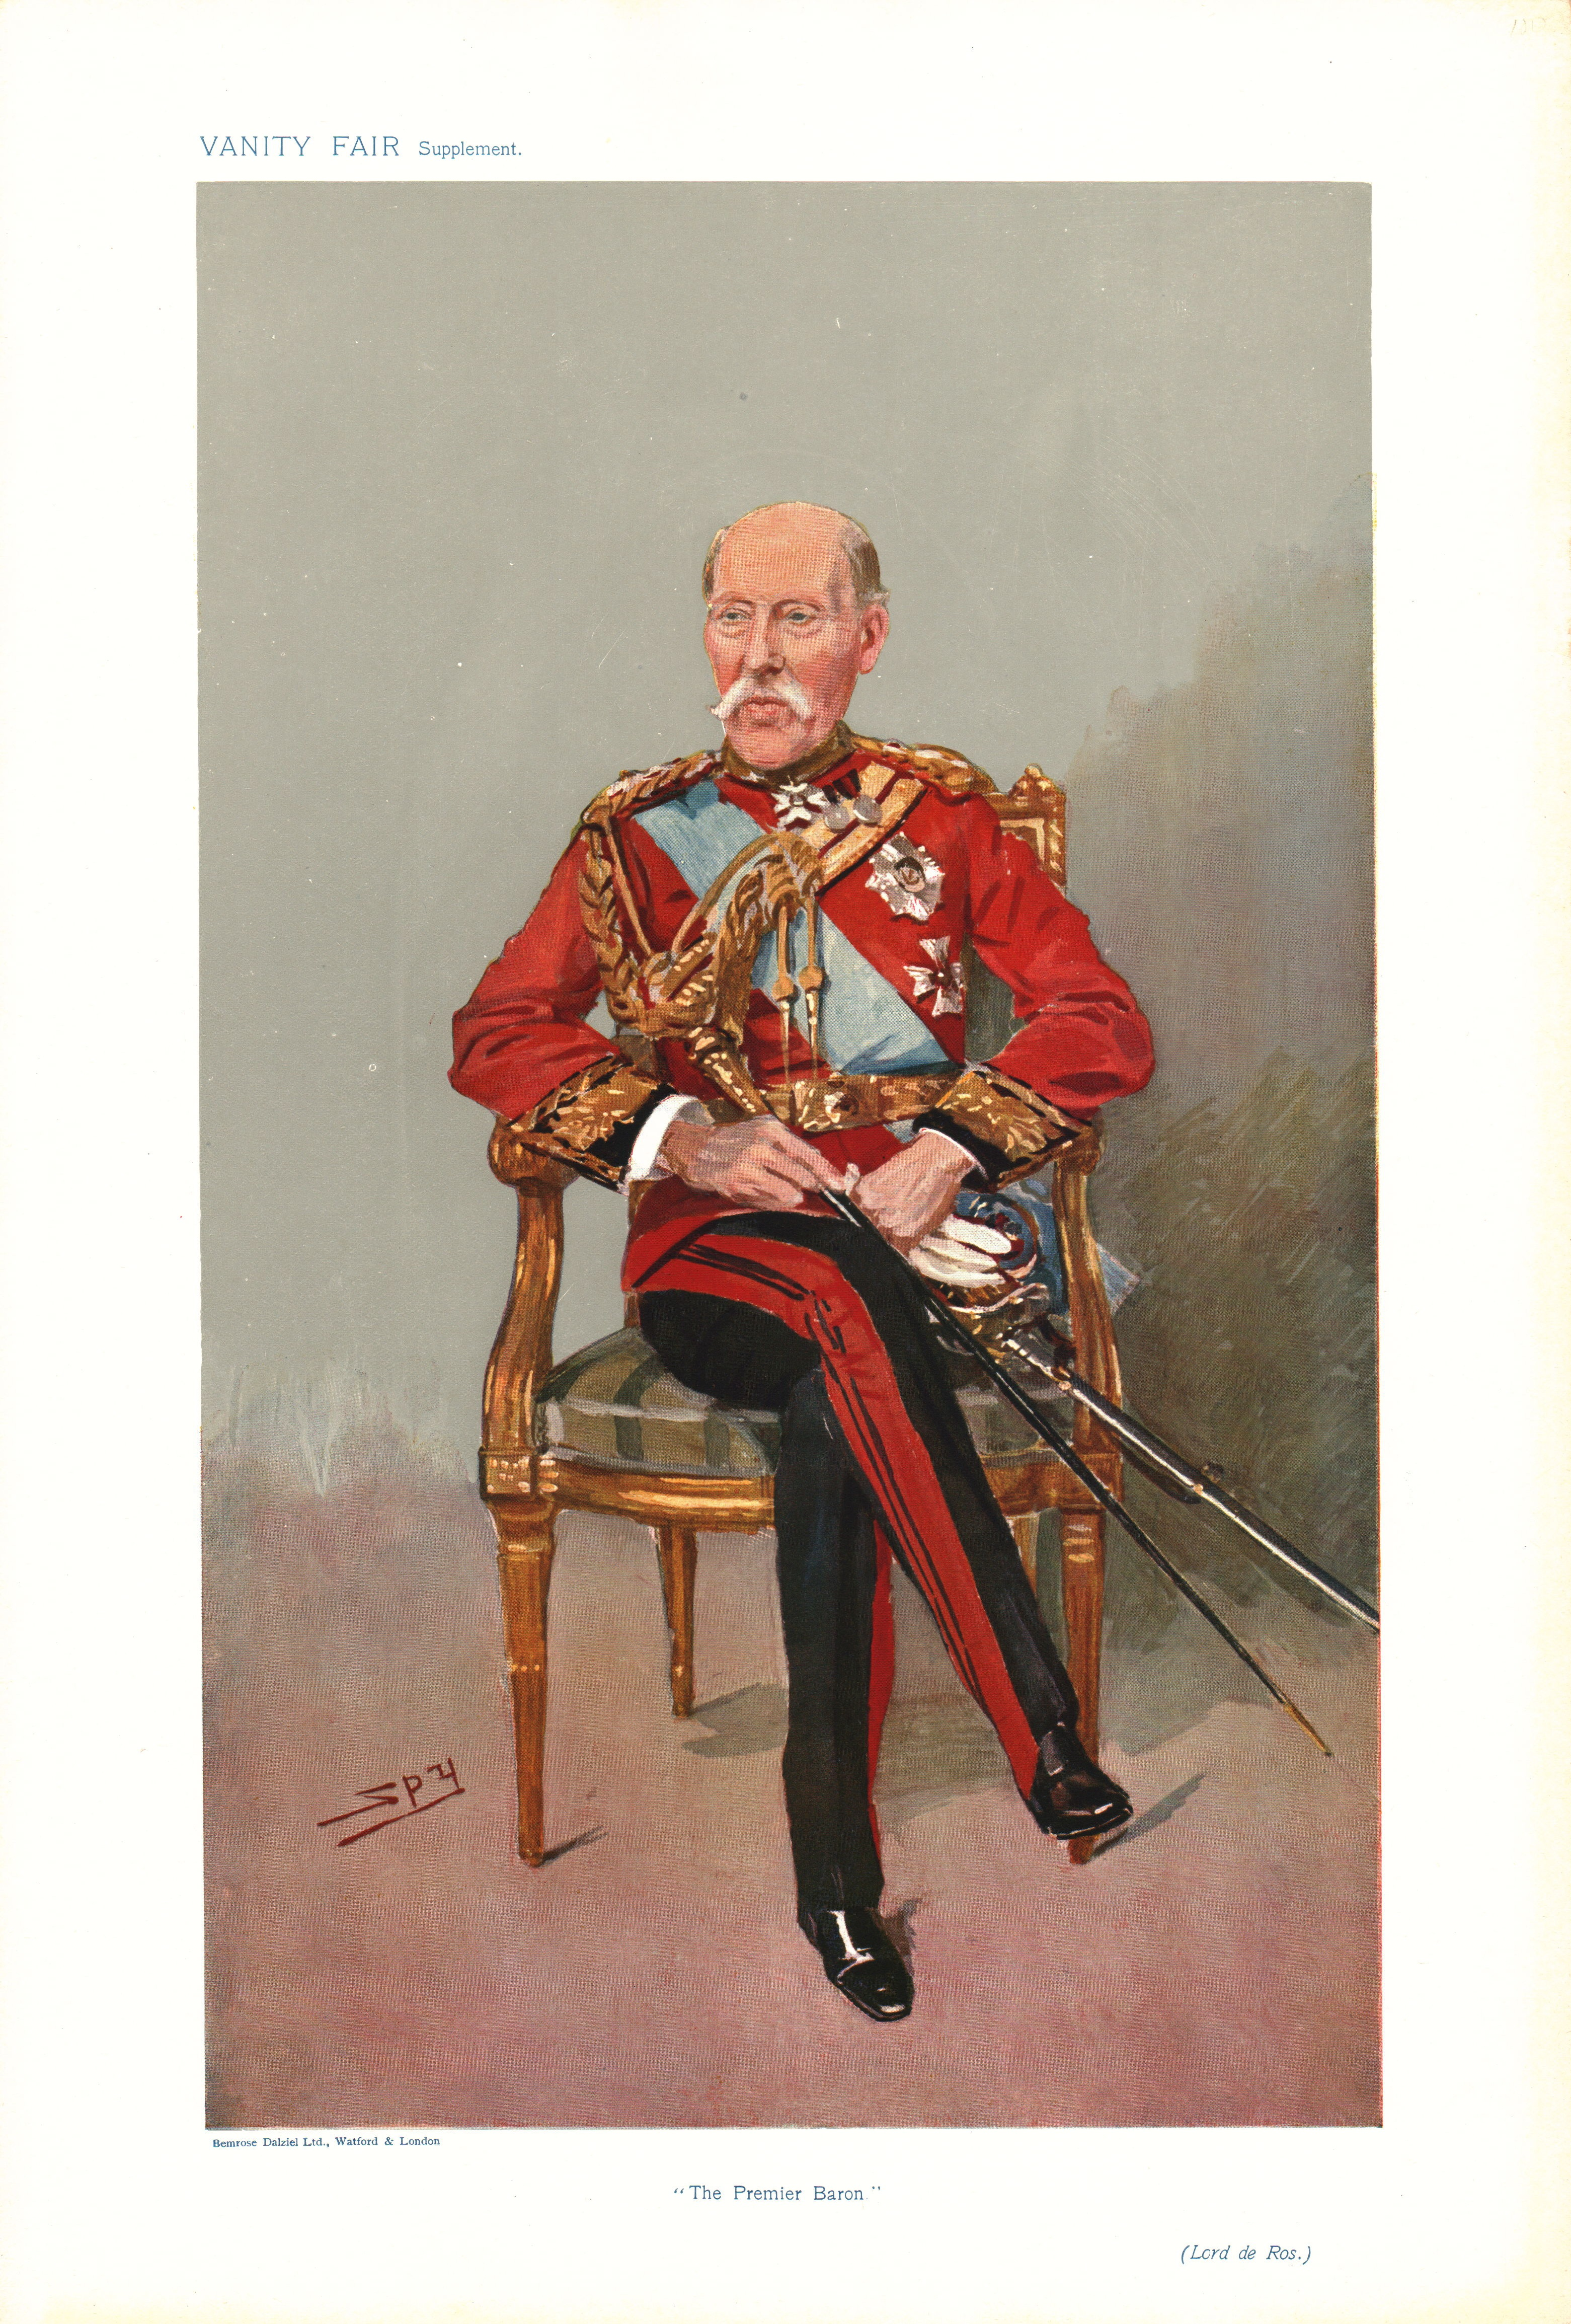 The Premier Baron